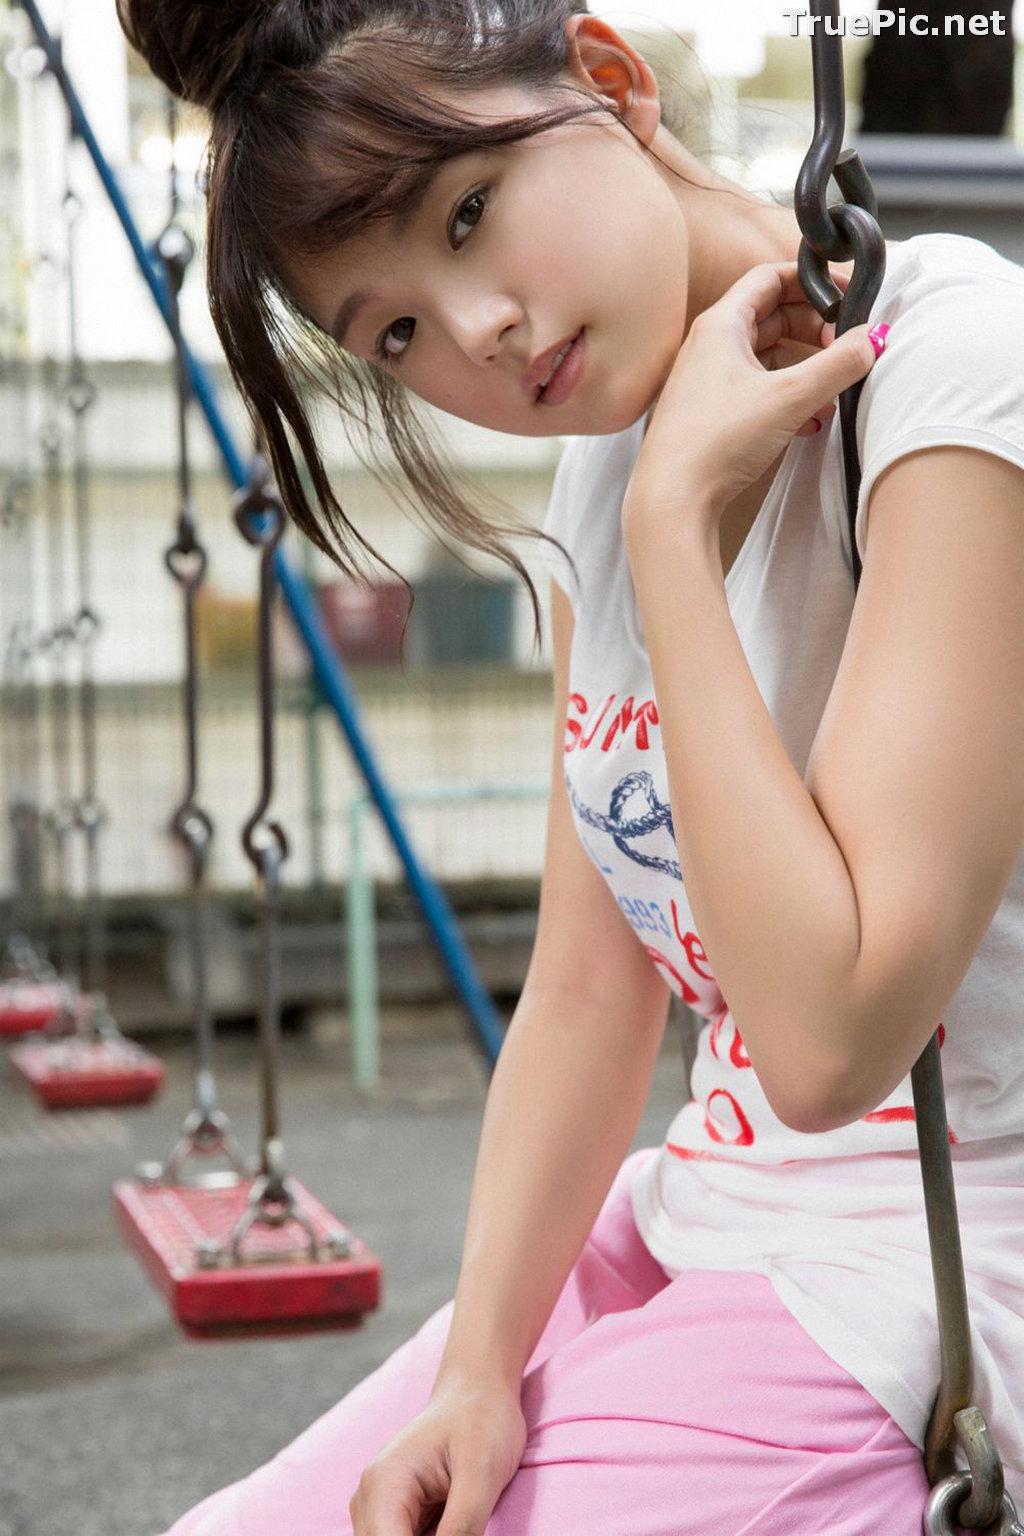 Image Photo album YS-Web Vol.629 - Japanese Gravure Idol - Ai Shinozaki - TruePic.net - Picture-6